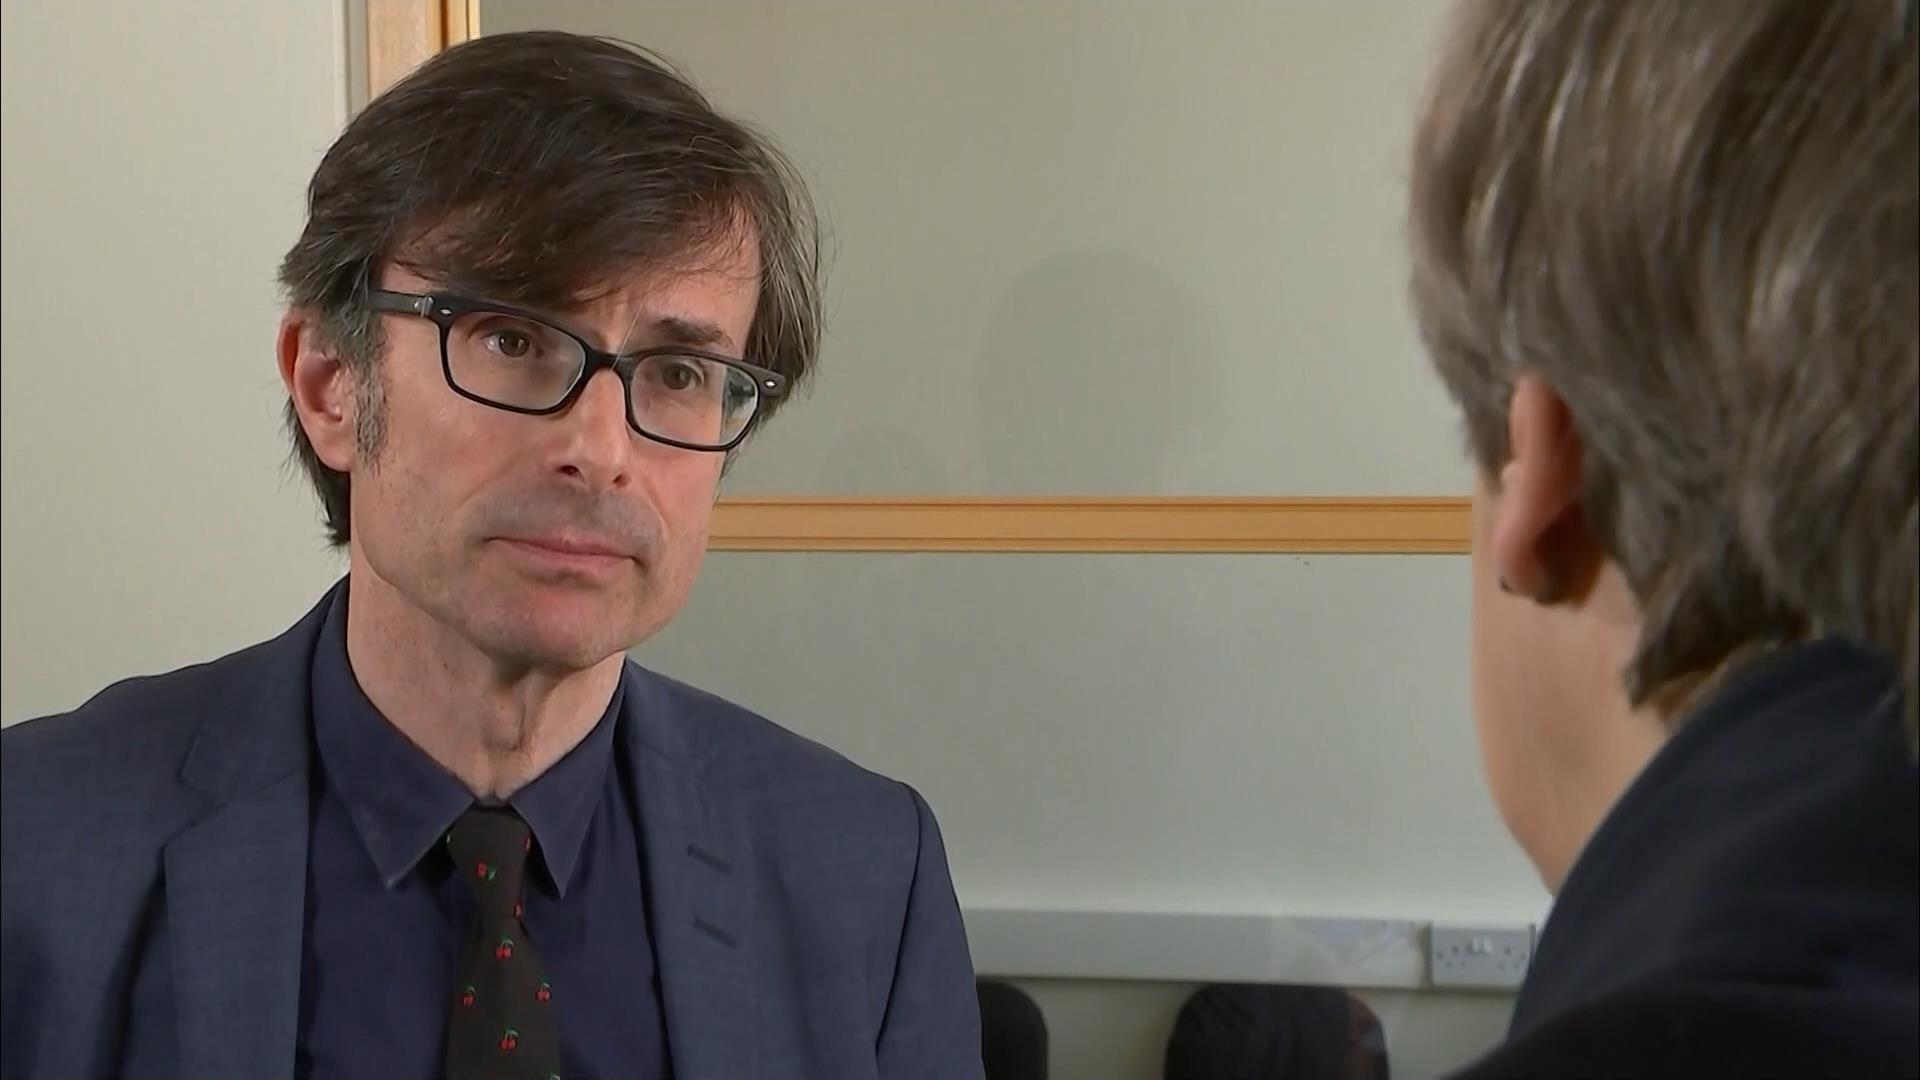 Robert Peston - ITV News Reporter (7)